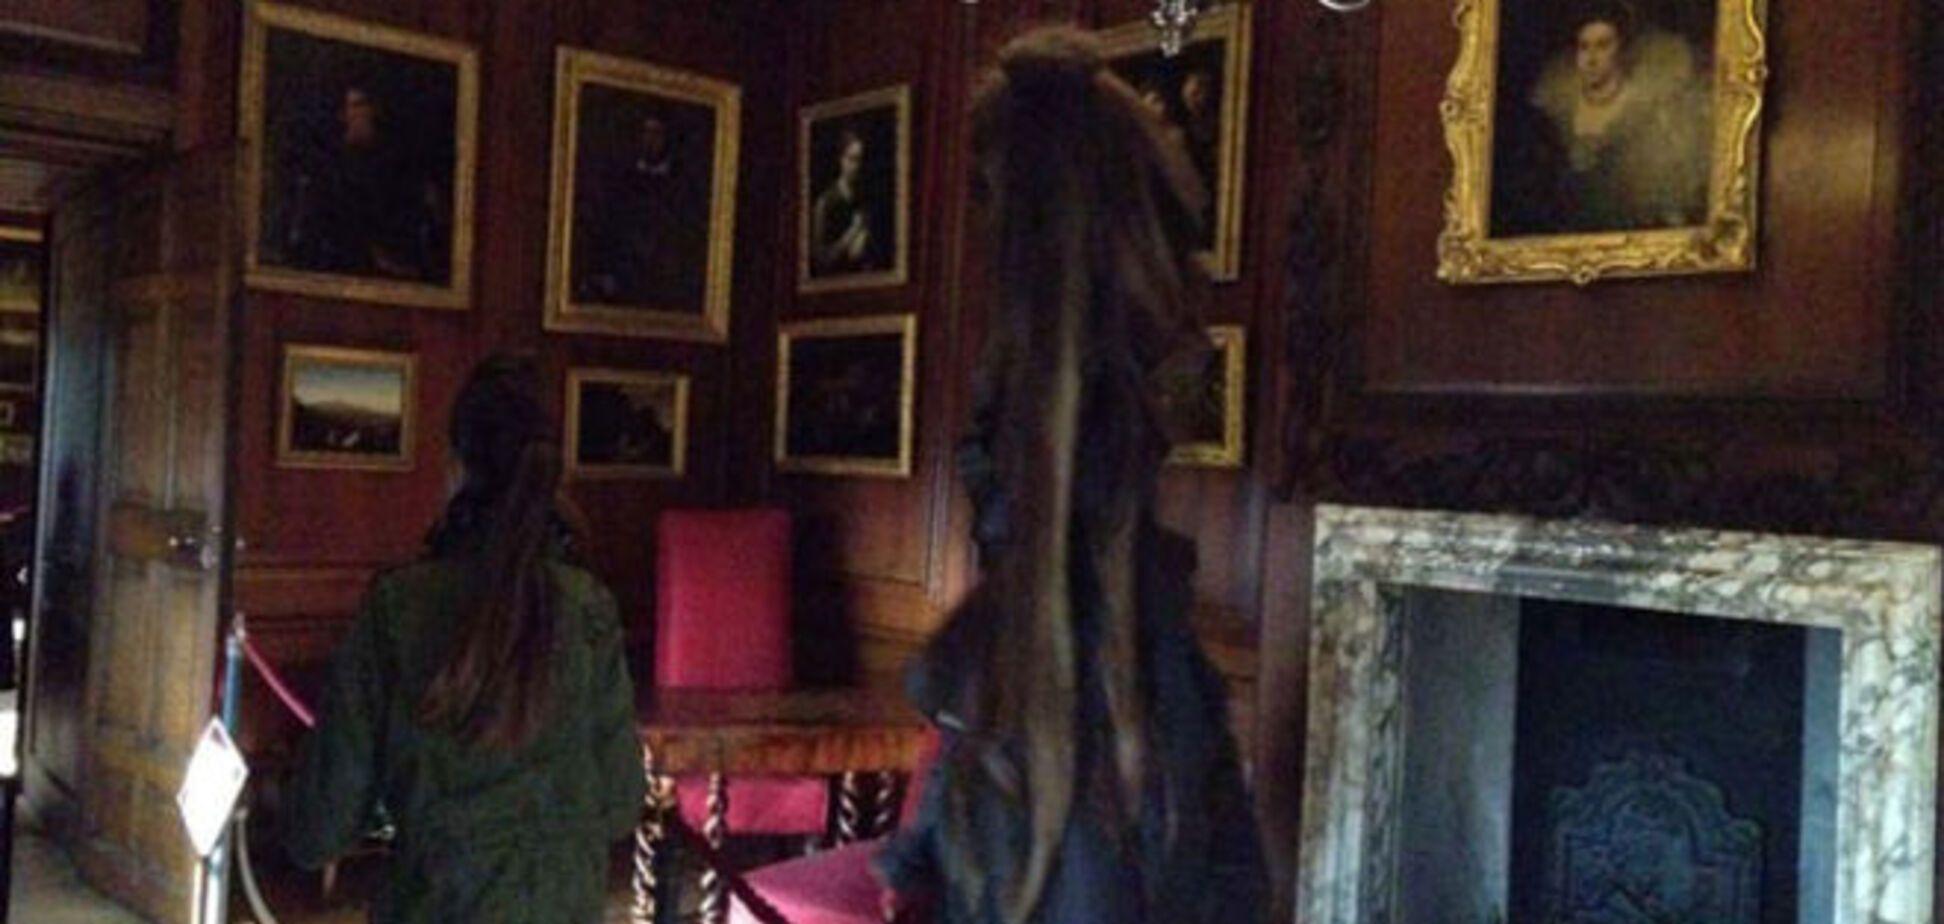 Школьница сняла на iPhone призрака в дворце Лондона: фотофакт